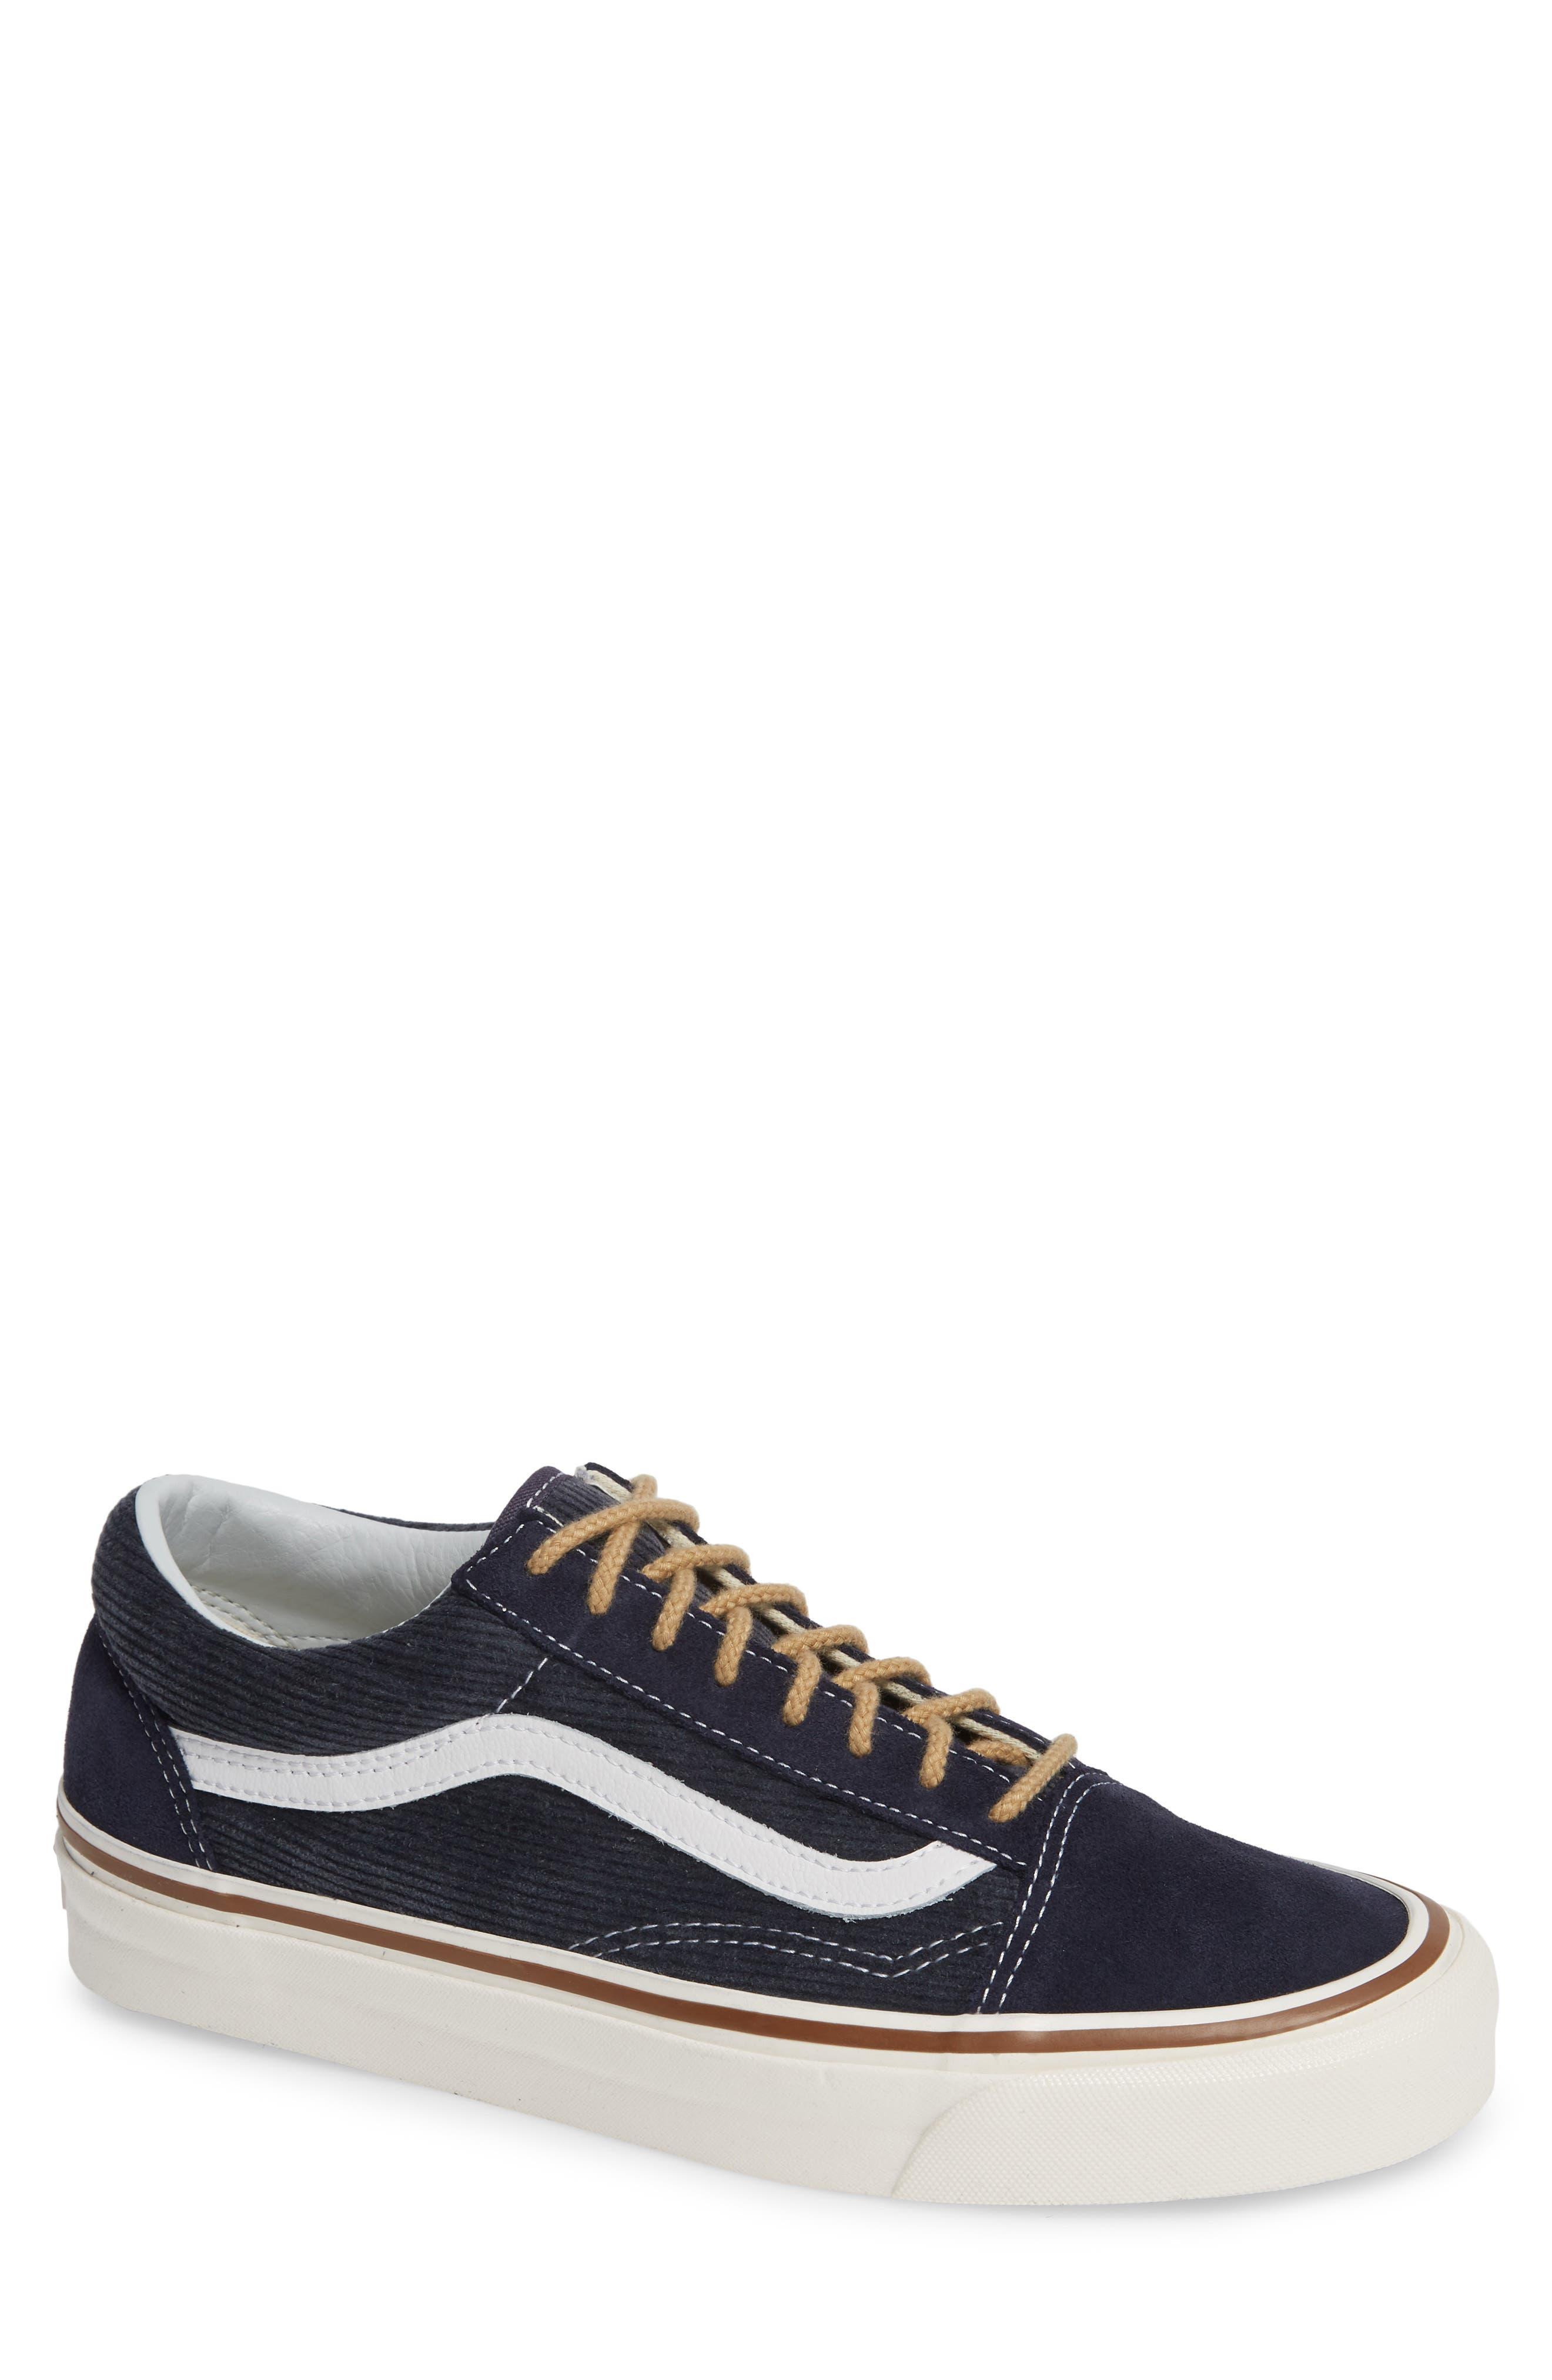 Anaheim Factory Old Skool 36 DX Sneaker,                         Main,                         color, NAVY/ SUEDE/ CORDUROY